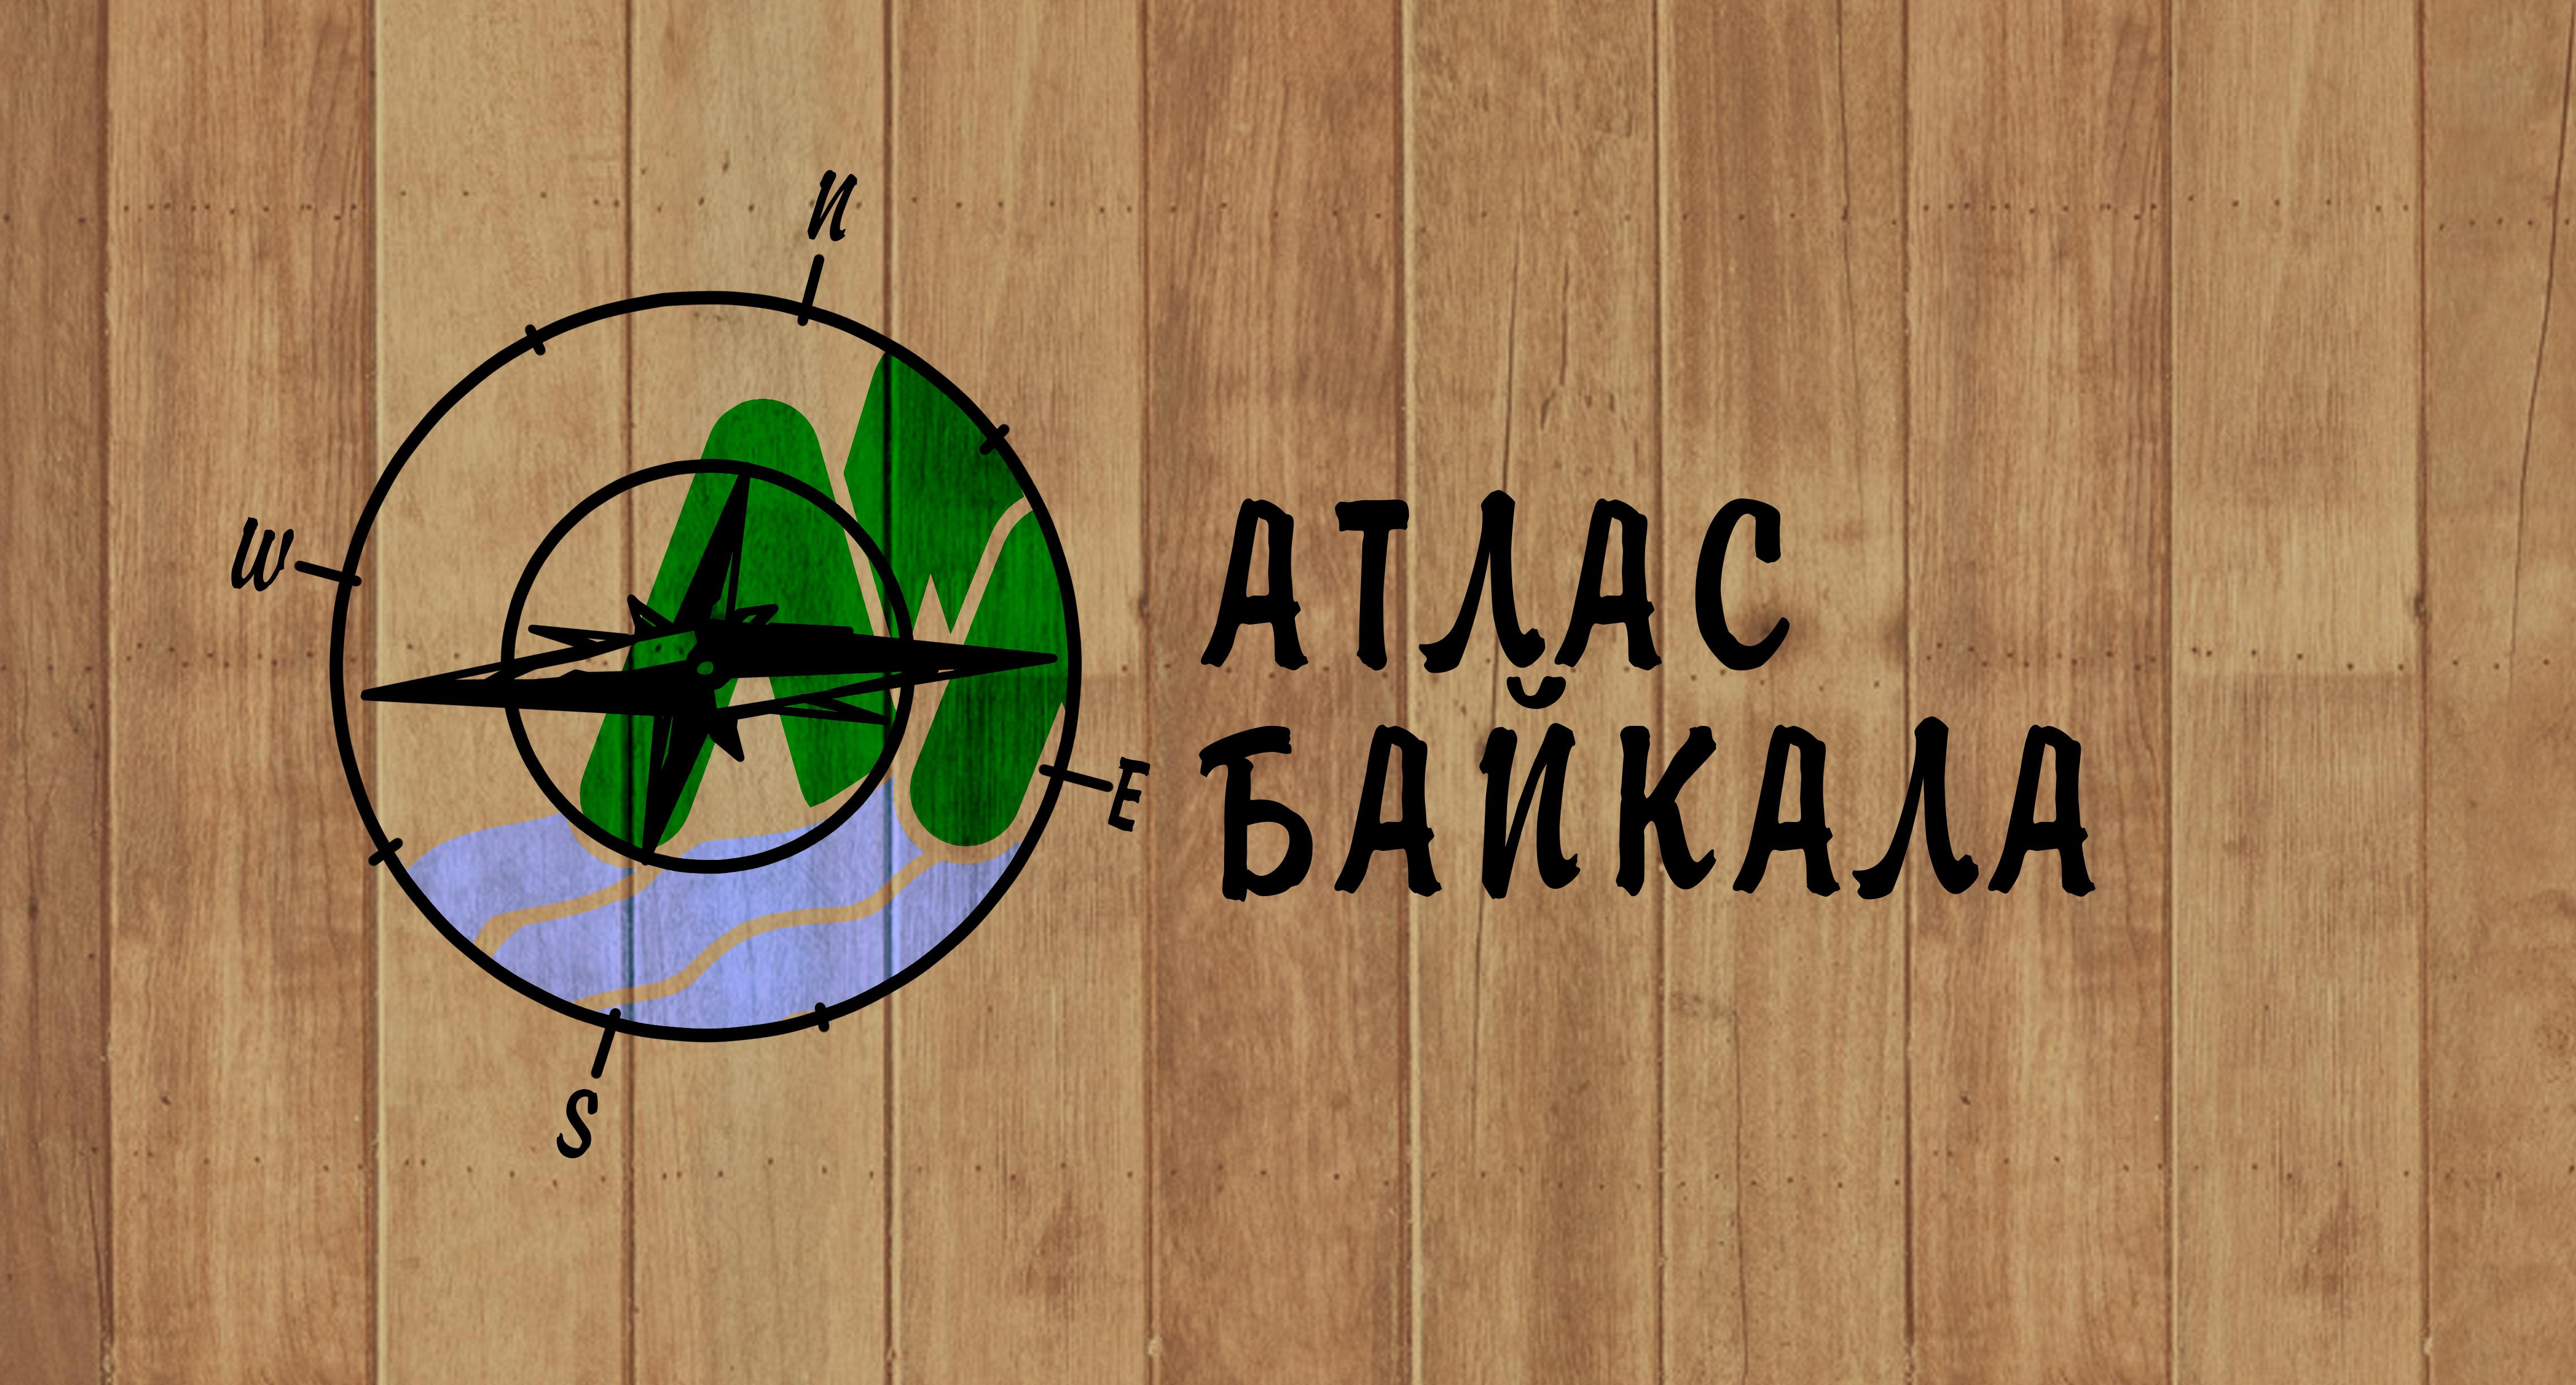 Разработка логотипа Атлас Байкала фото f_3375afc59d3496e1.jpg